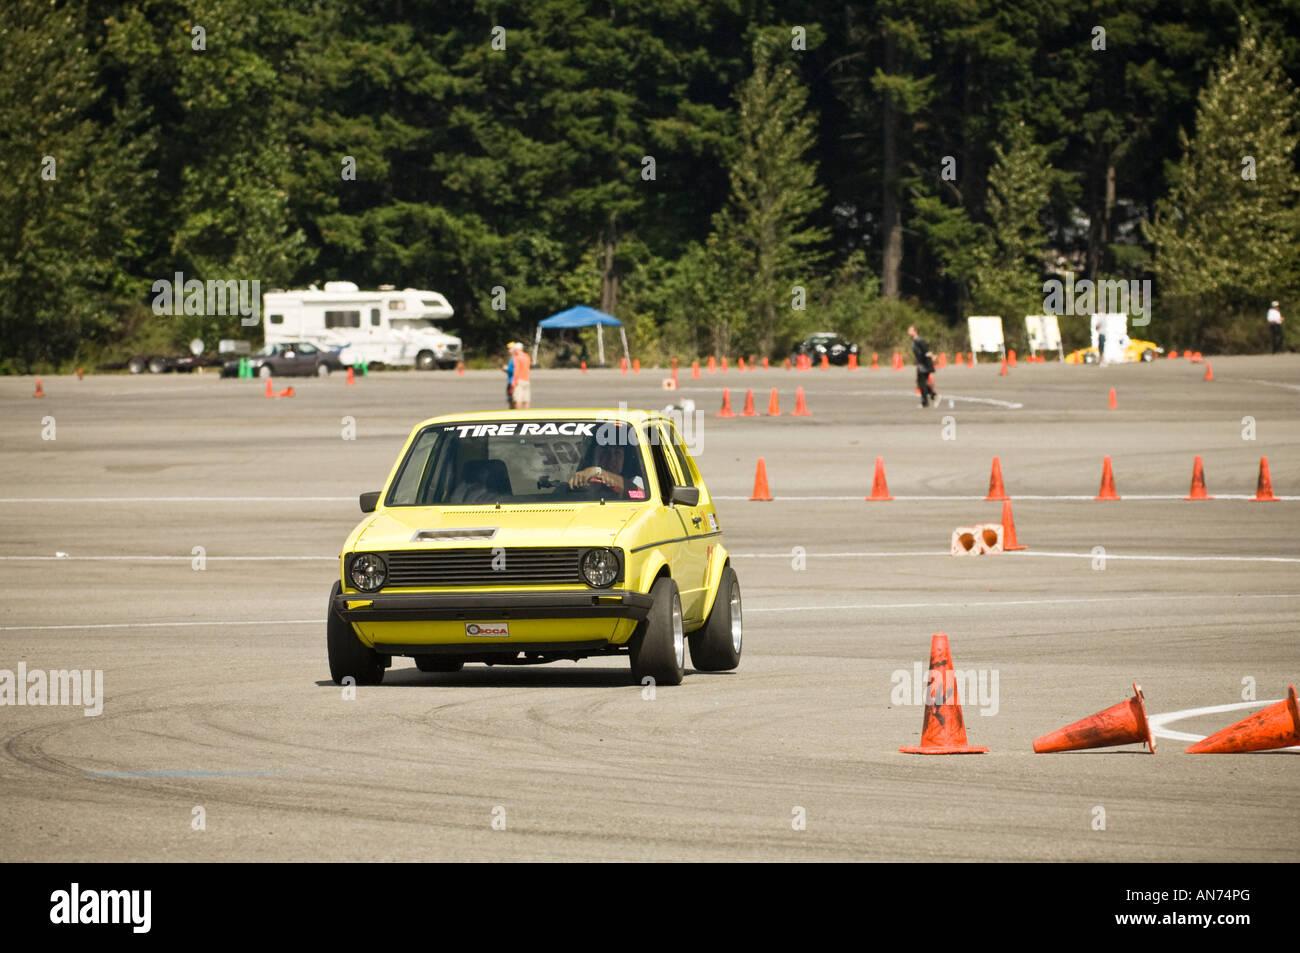 Sports Car Club Of America Autocross Event Held At Hampton Mills